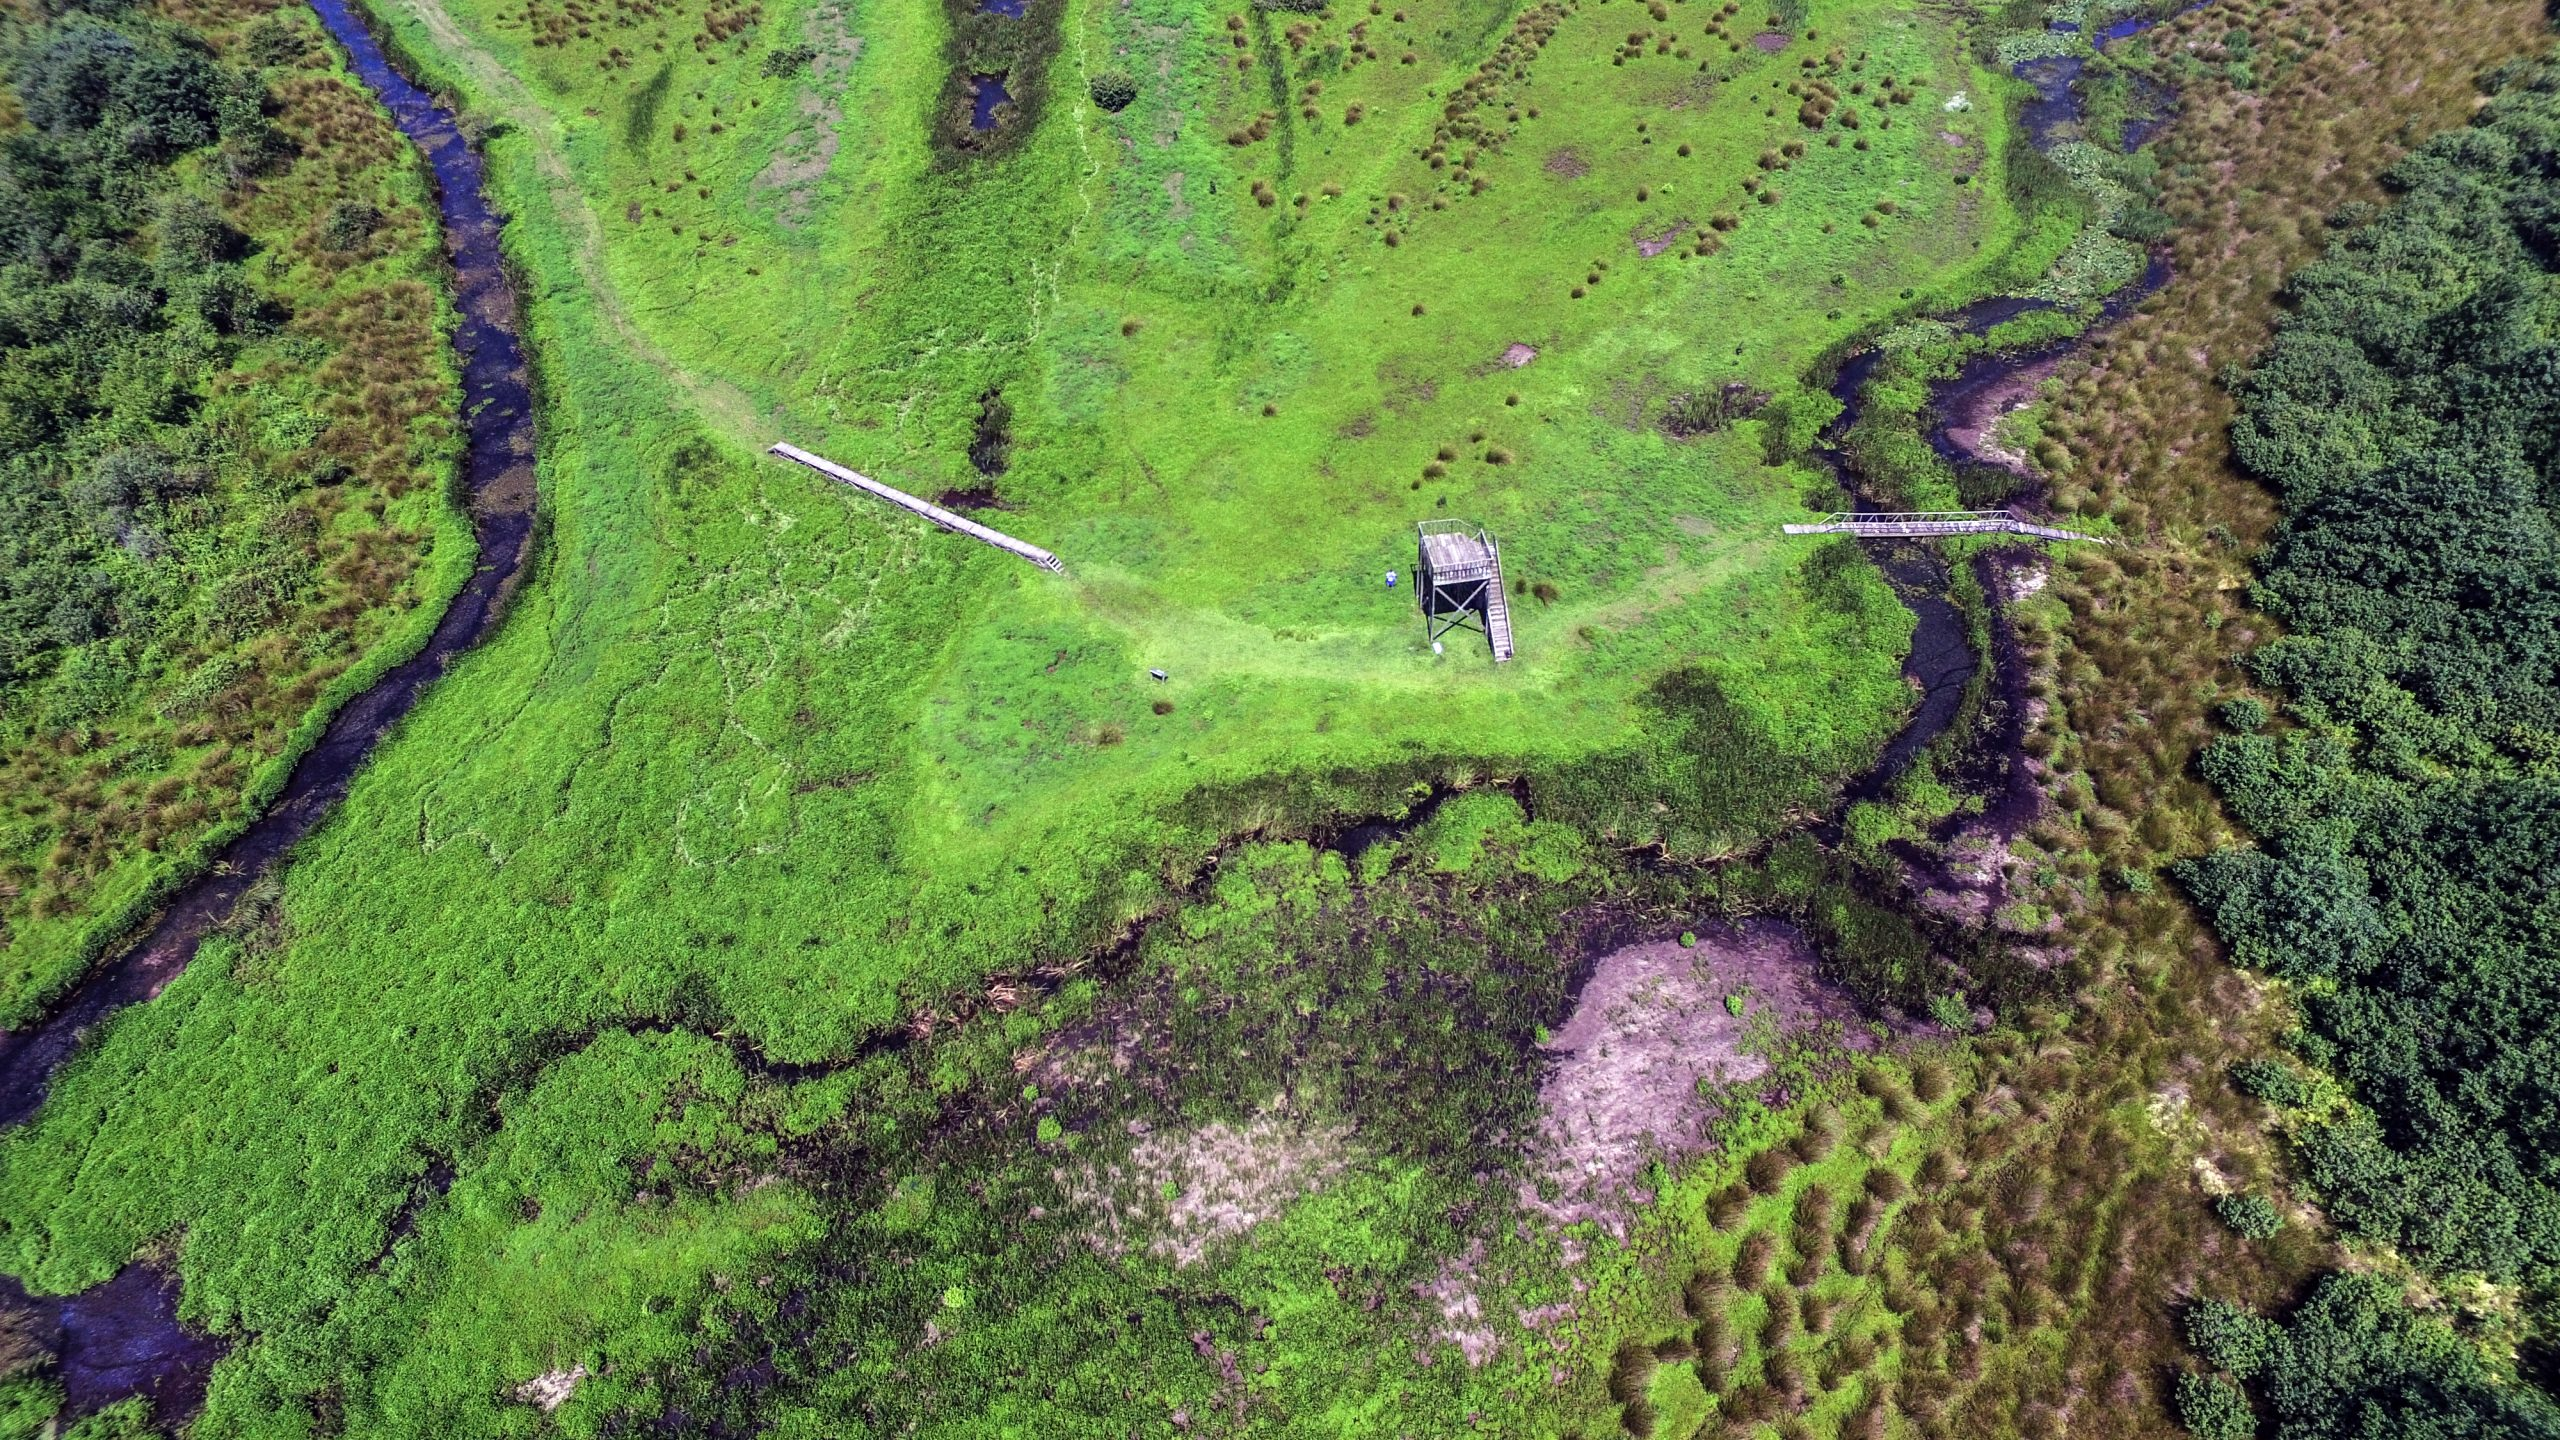 Kobuleti Protected Areas. Aerial view, partial (Kobuleti Strict Nature Reserve and Kobuleti Managed Reserve).